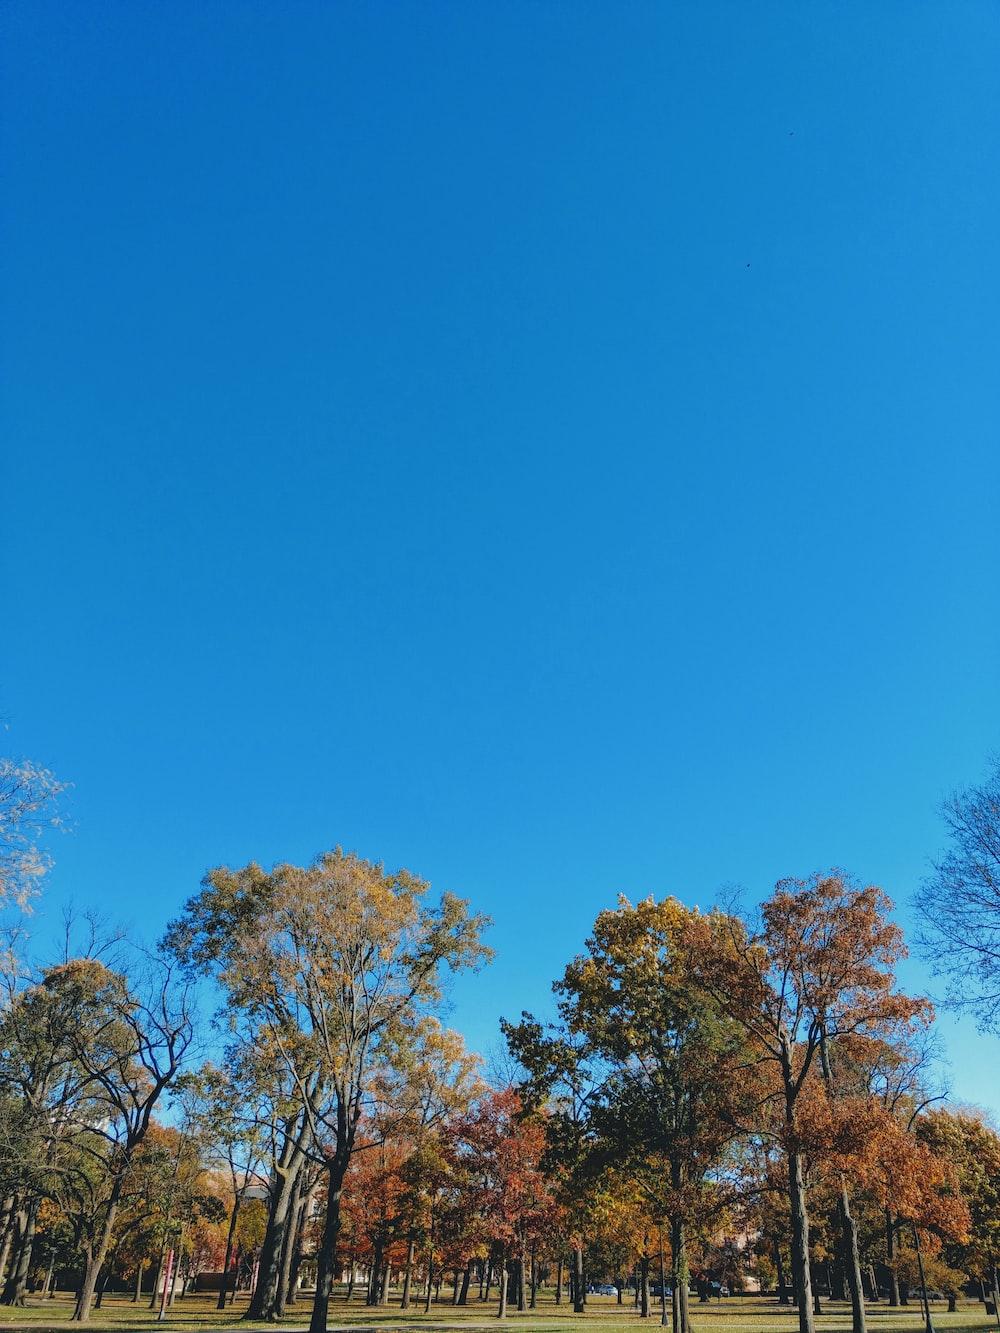 green and orange leafy trees